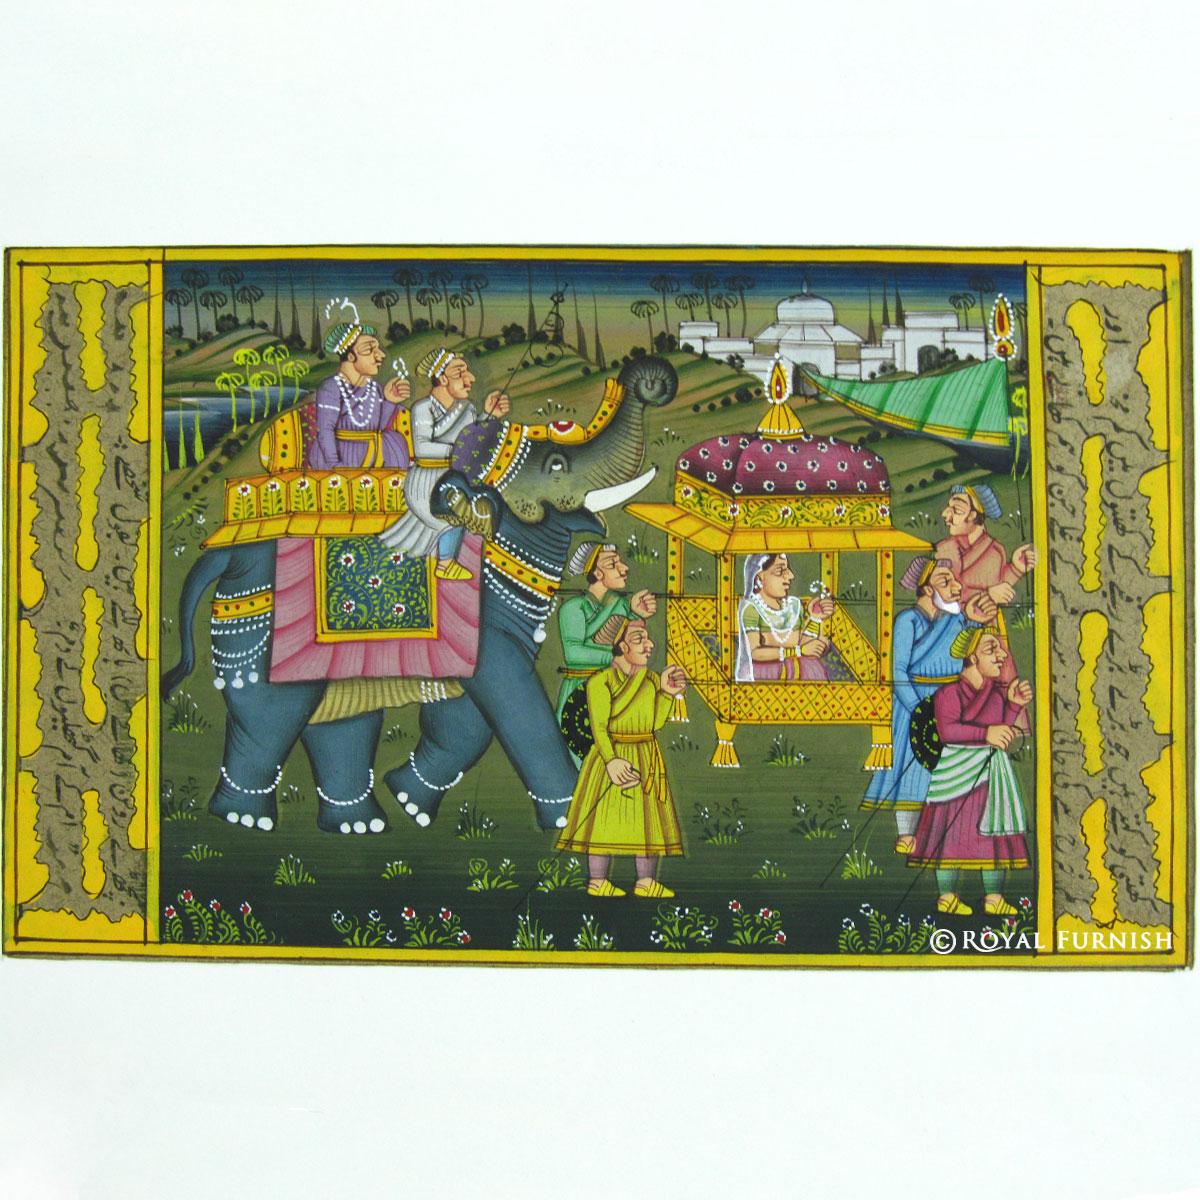 Rajasthani Traditional Mughal Procession Miniature